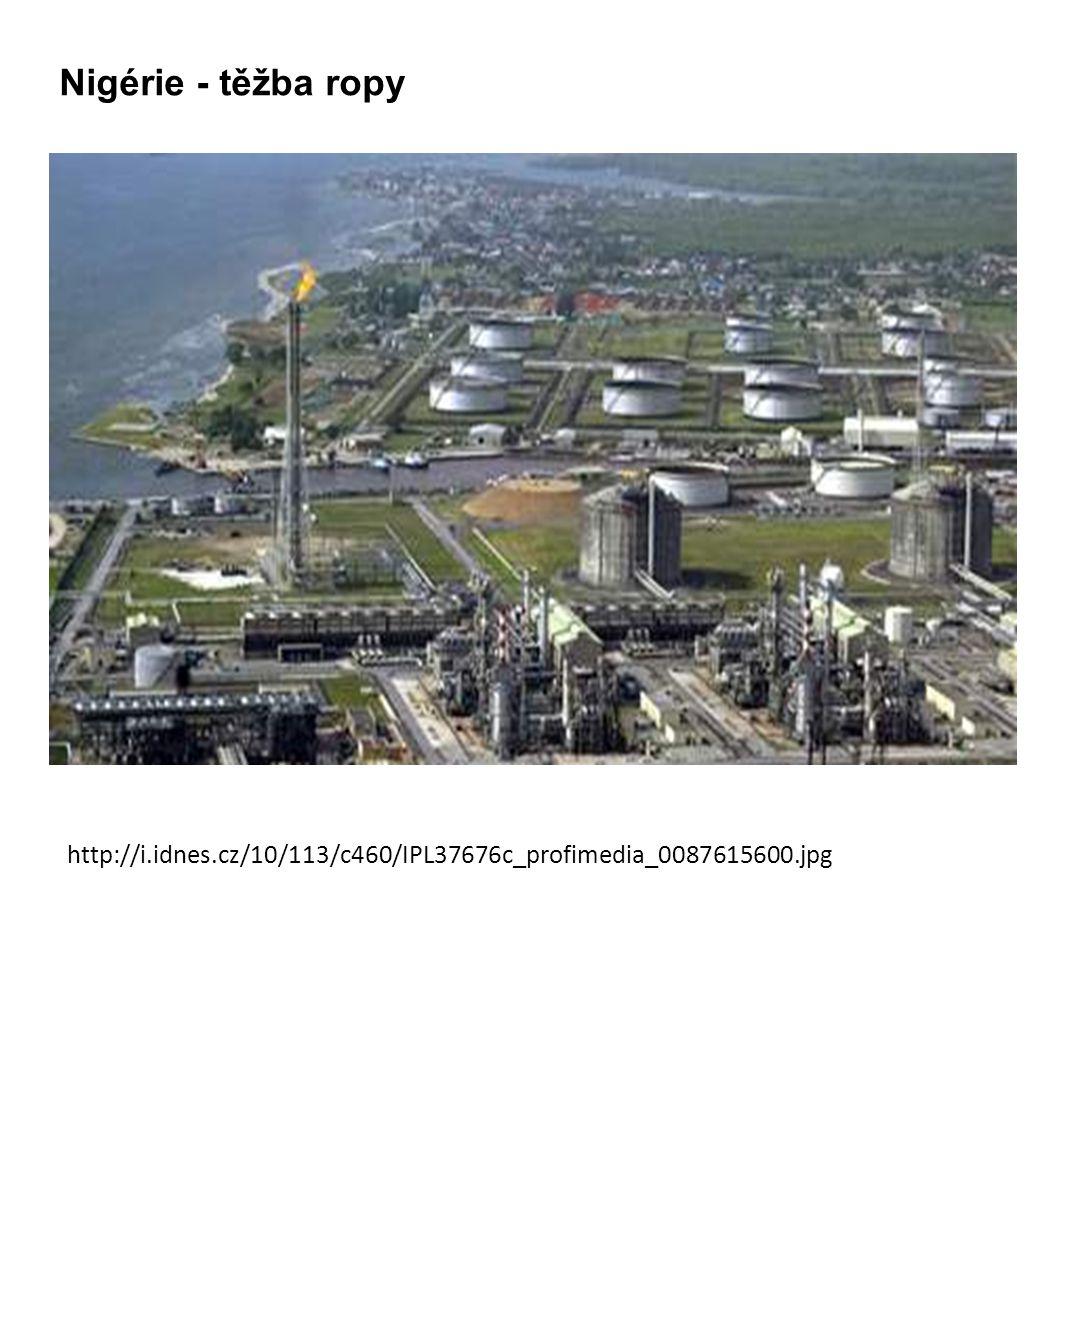 Nigérie - těžba ropy http://i.idnes.cz/10/113/c460/IPL37676c_profimedia_0087615600.jpg